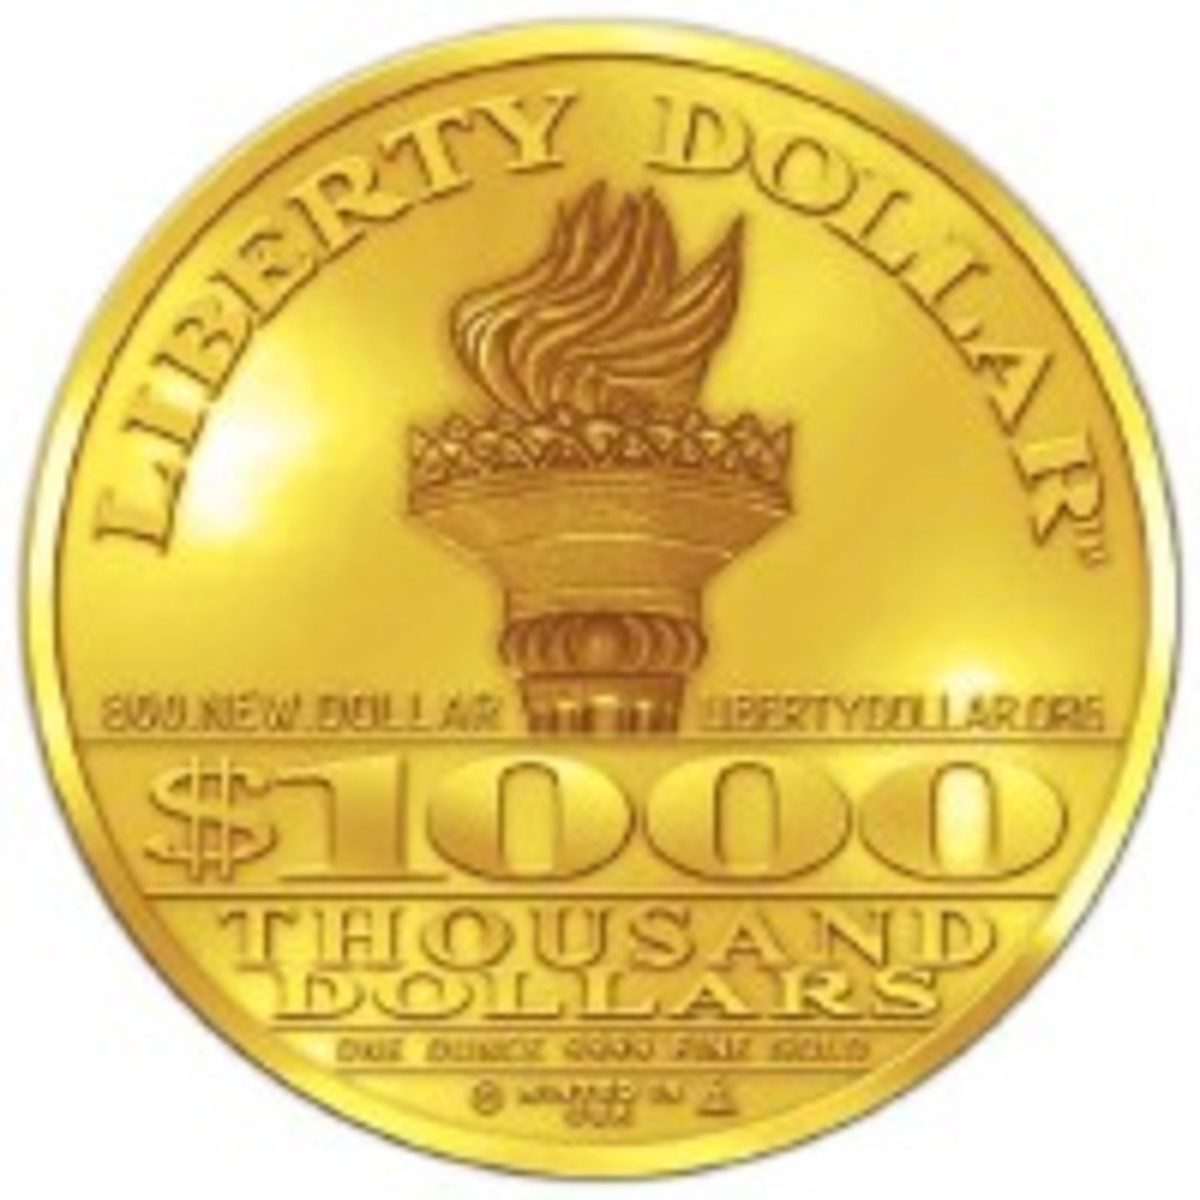 libertydollar200.jpg